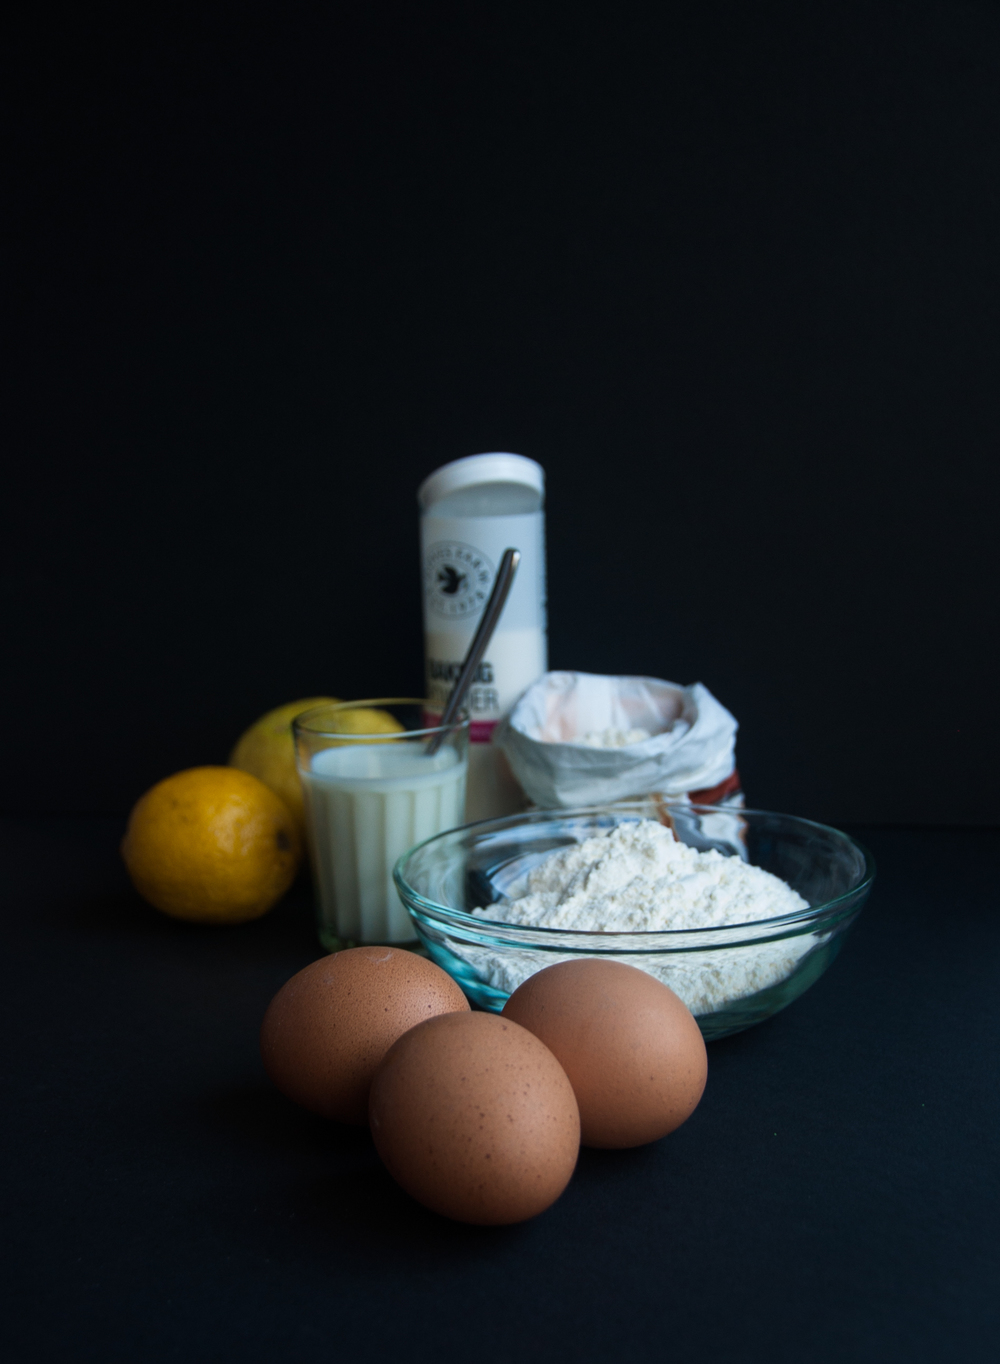 Ingredients for the lemon cake